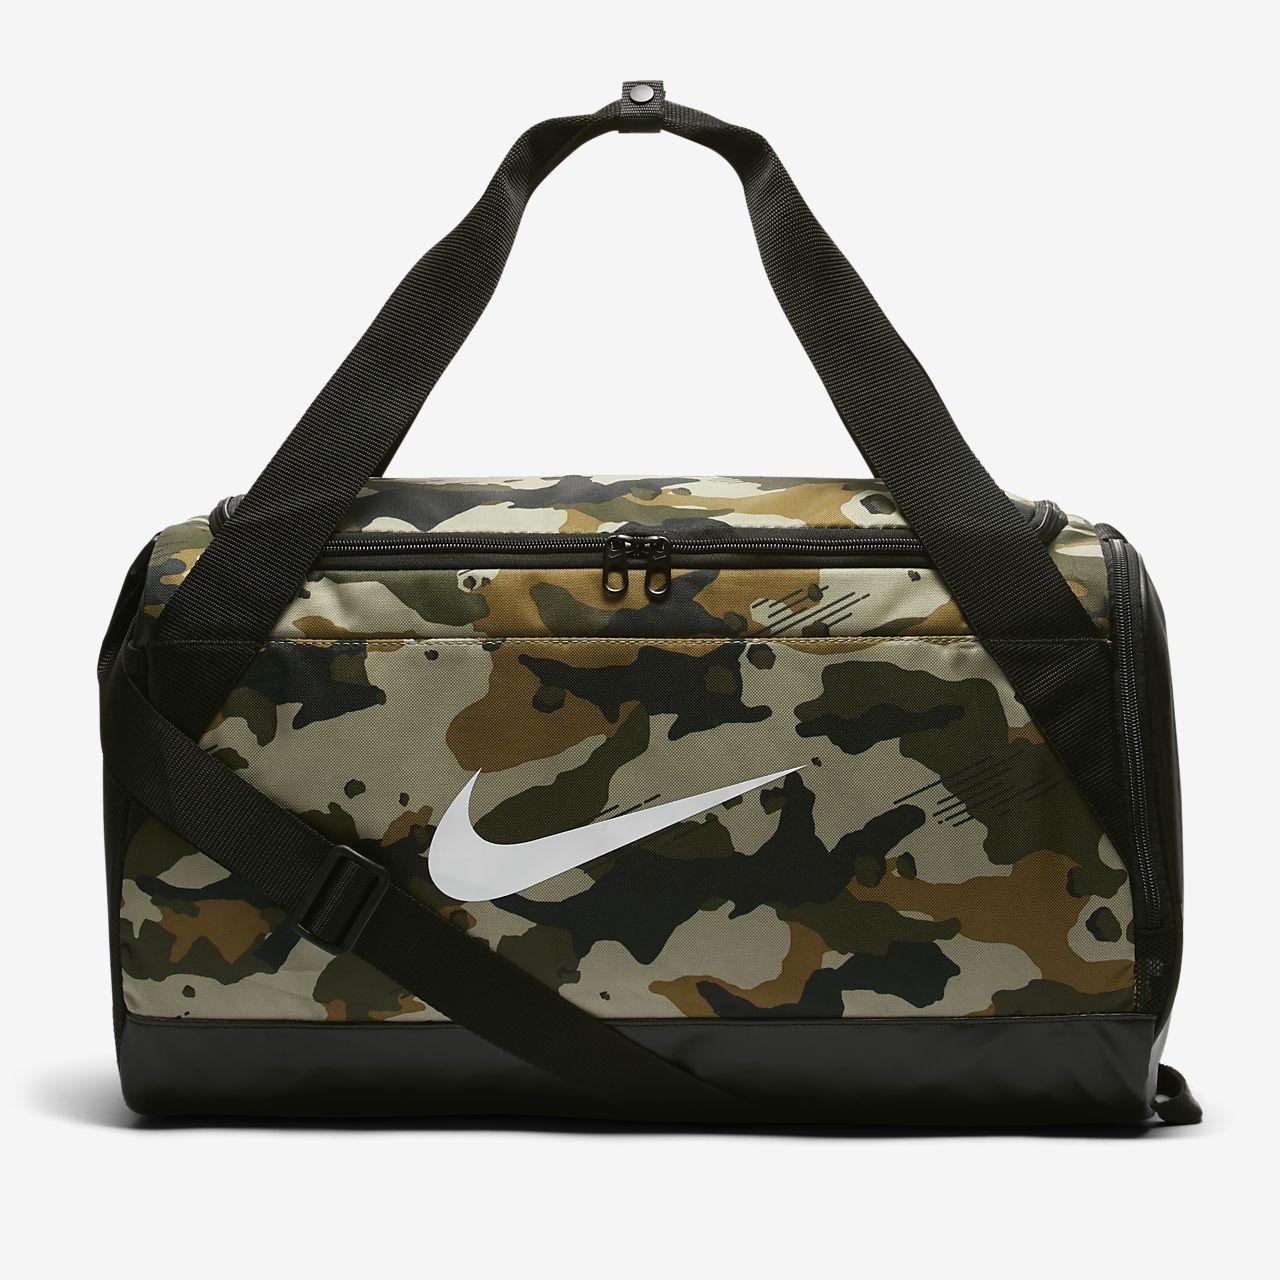 De Brasilia Graphic Bolsa Nike Deporte Entrenamiento Pequeña X7wqzzx xBCdoe